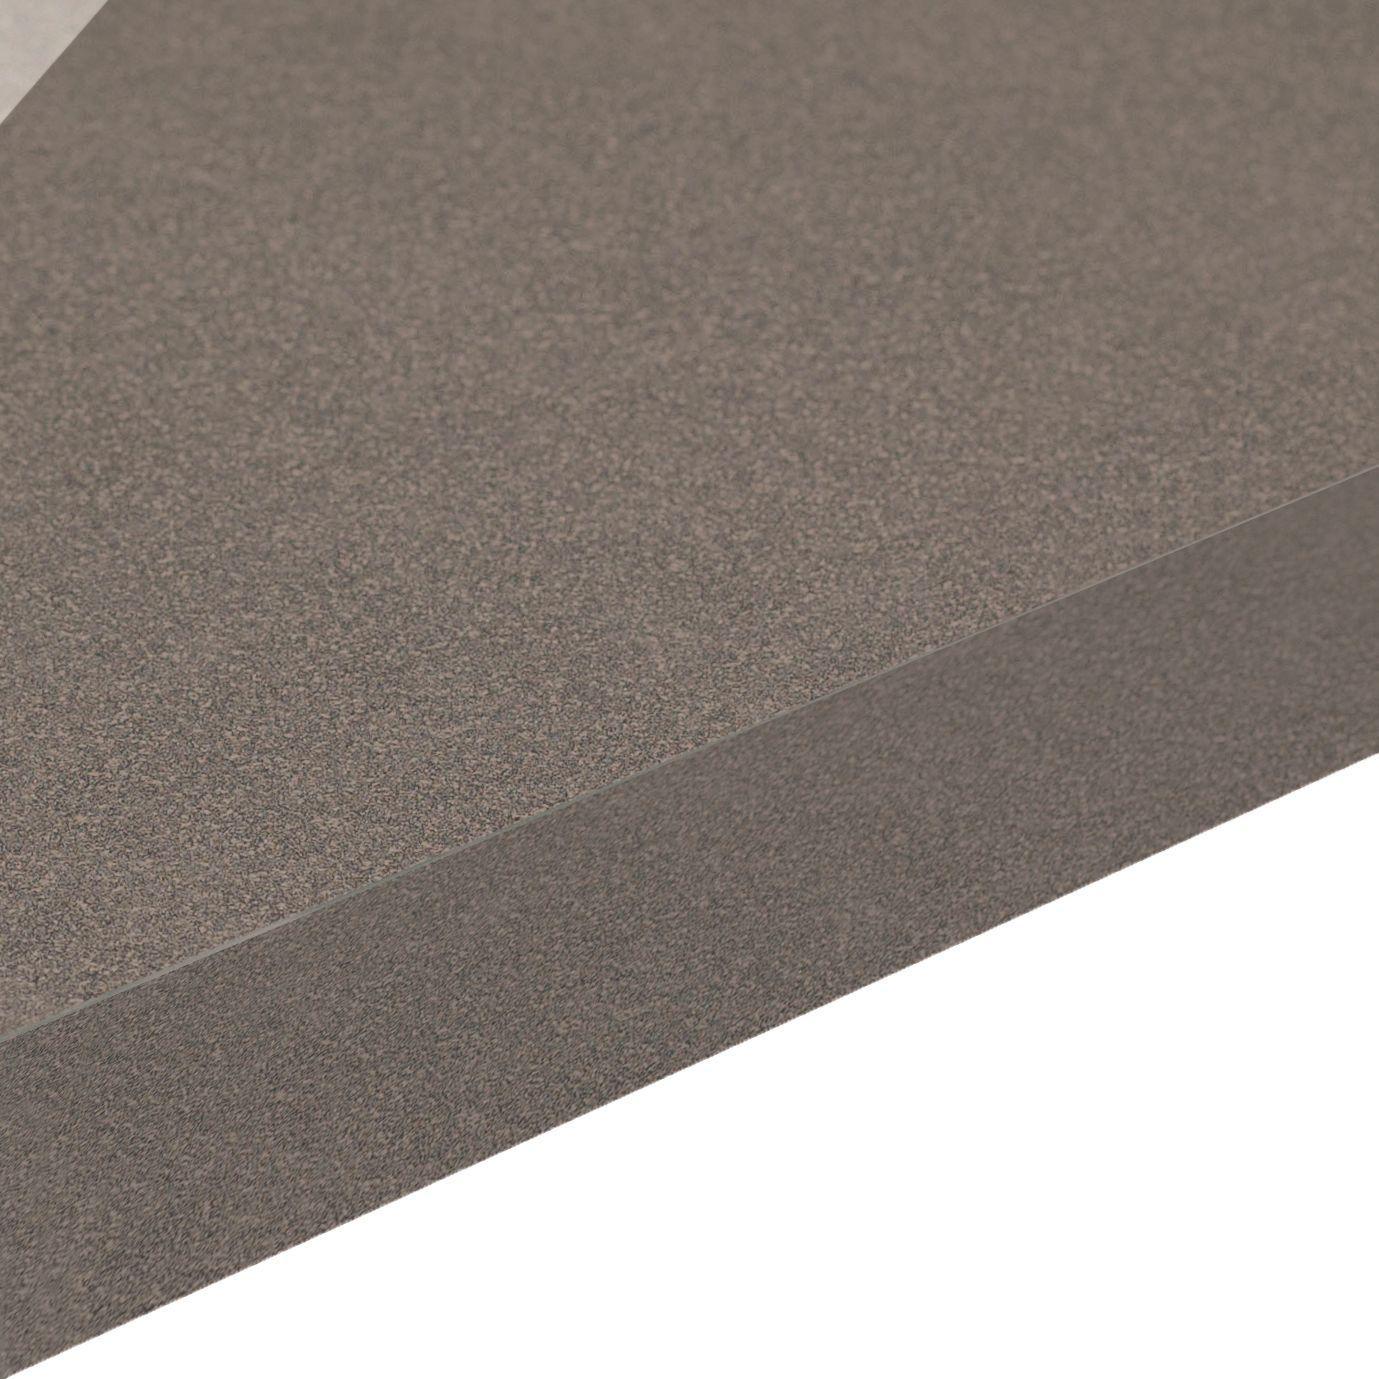 38mm aura black laminate gloss granite effect square edge for Zinc laminate